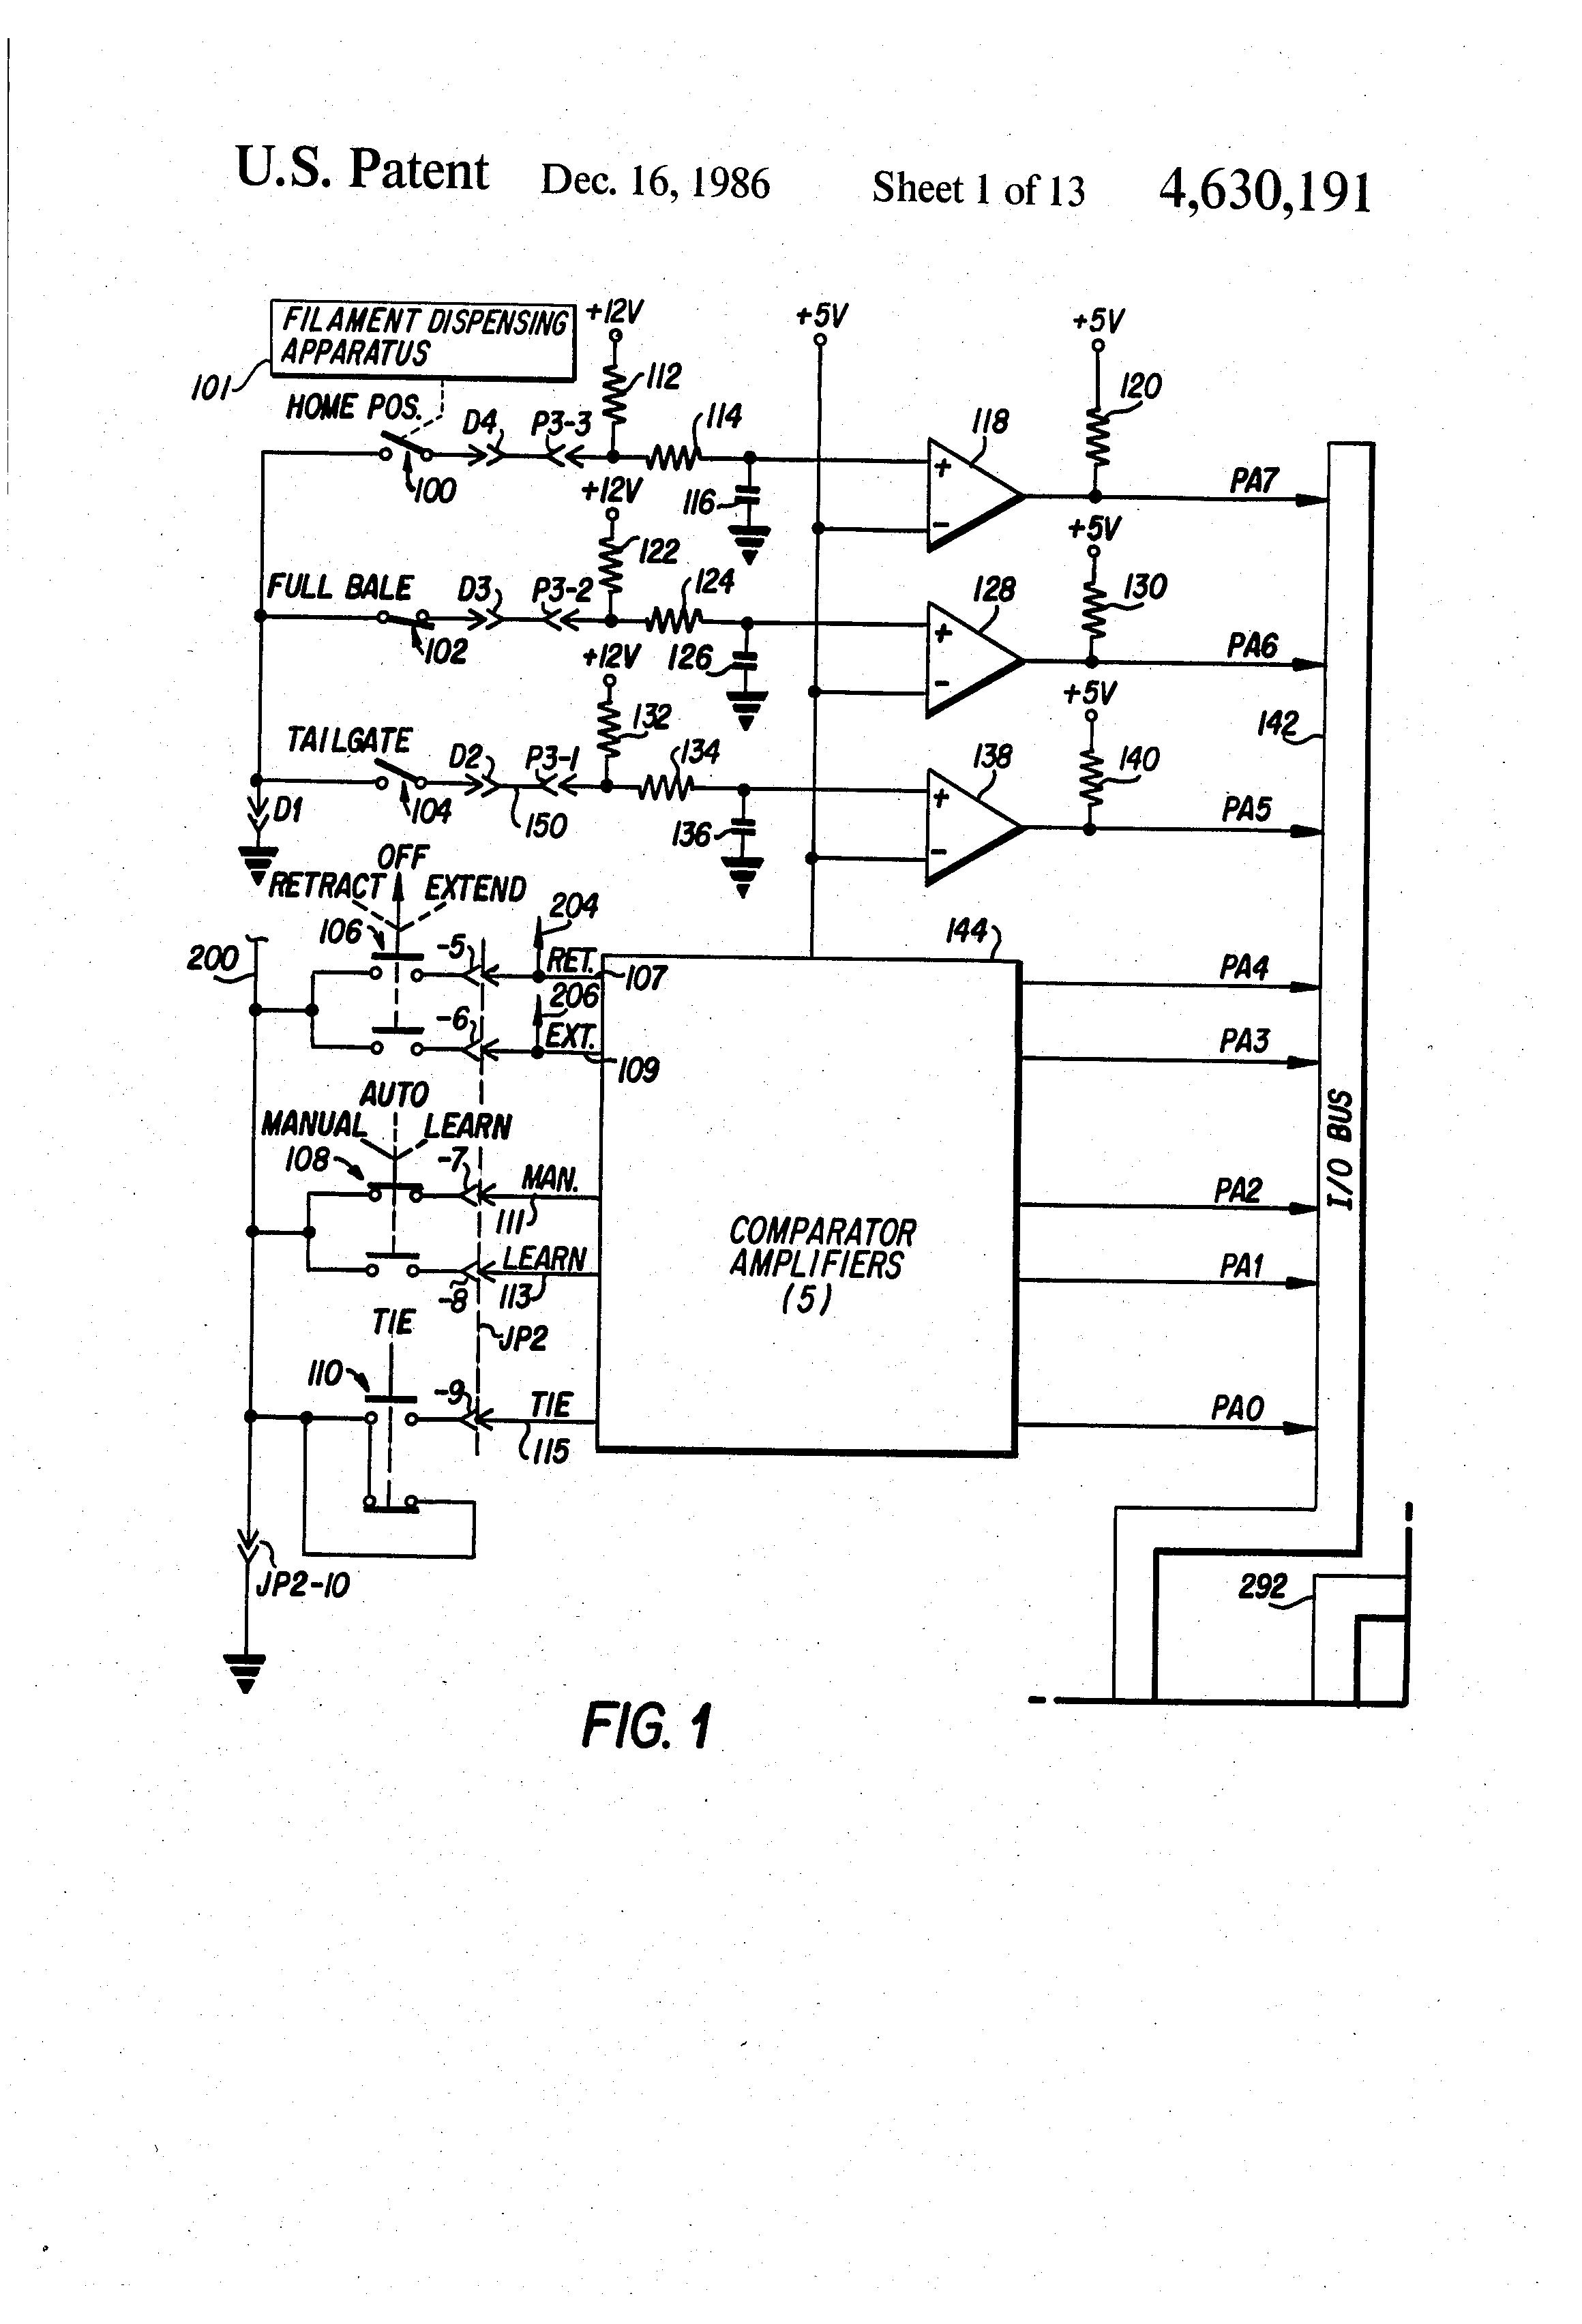 Ford 3415 Wiring Diagram - Harley Davidson Golf Cart Wiring Schematic for Wiring  Diagram SchematicsWiring Diagram Schematics